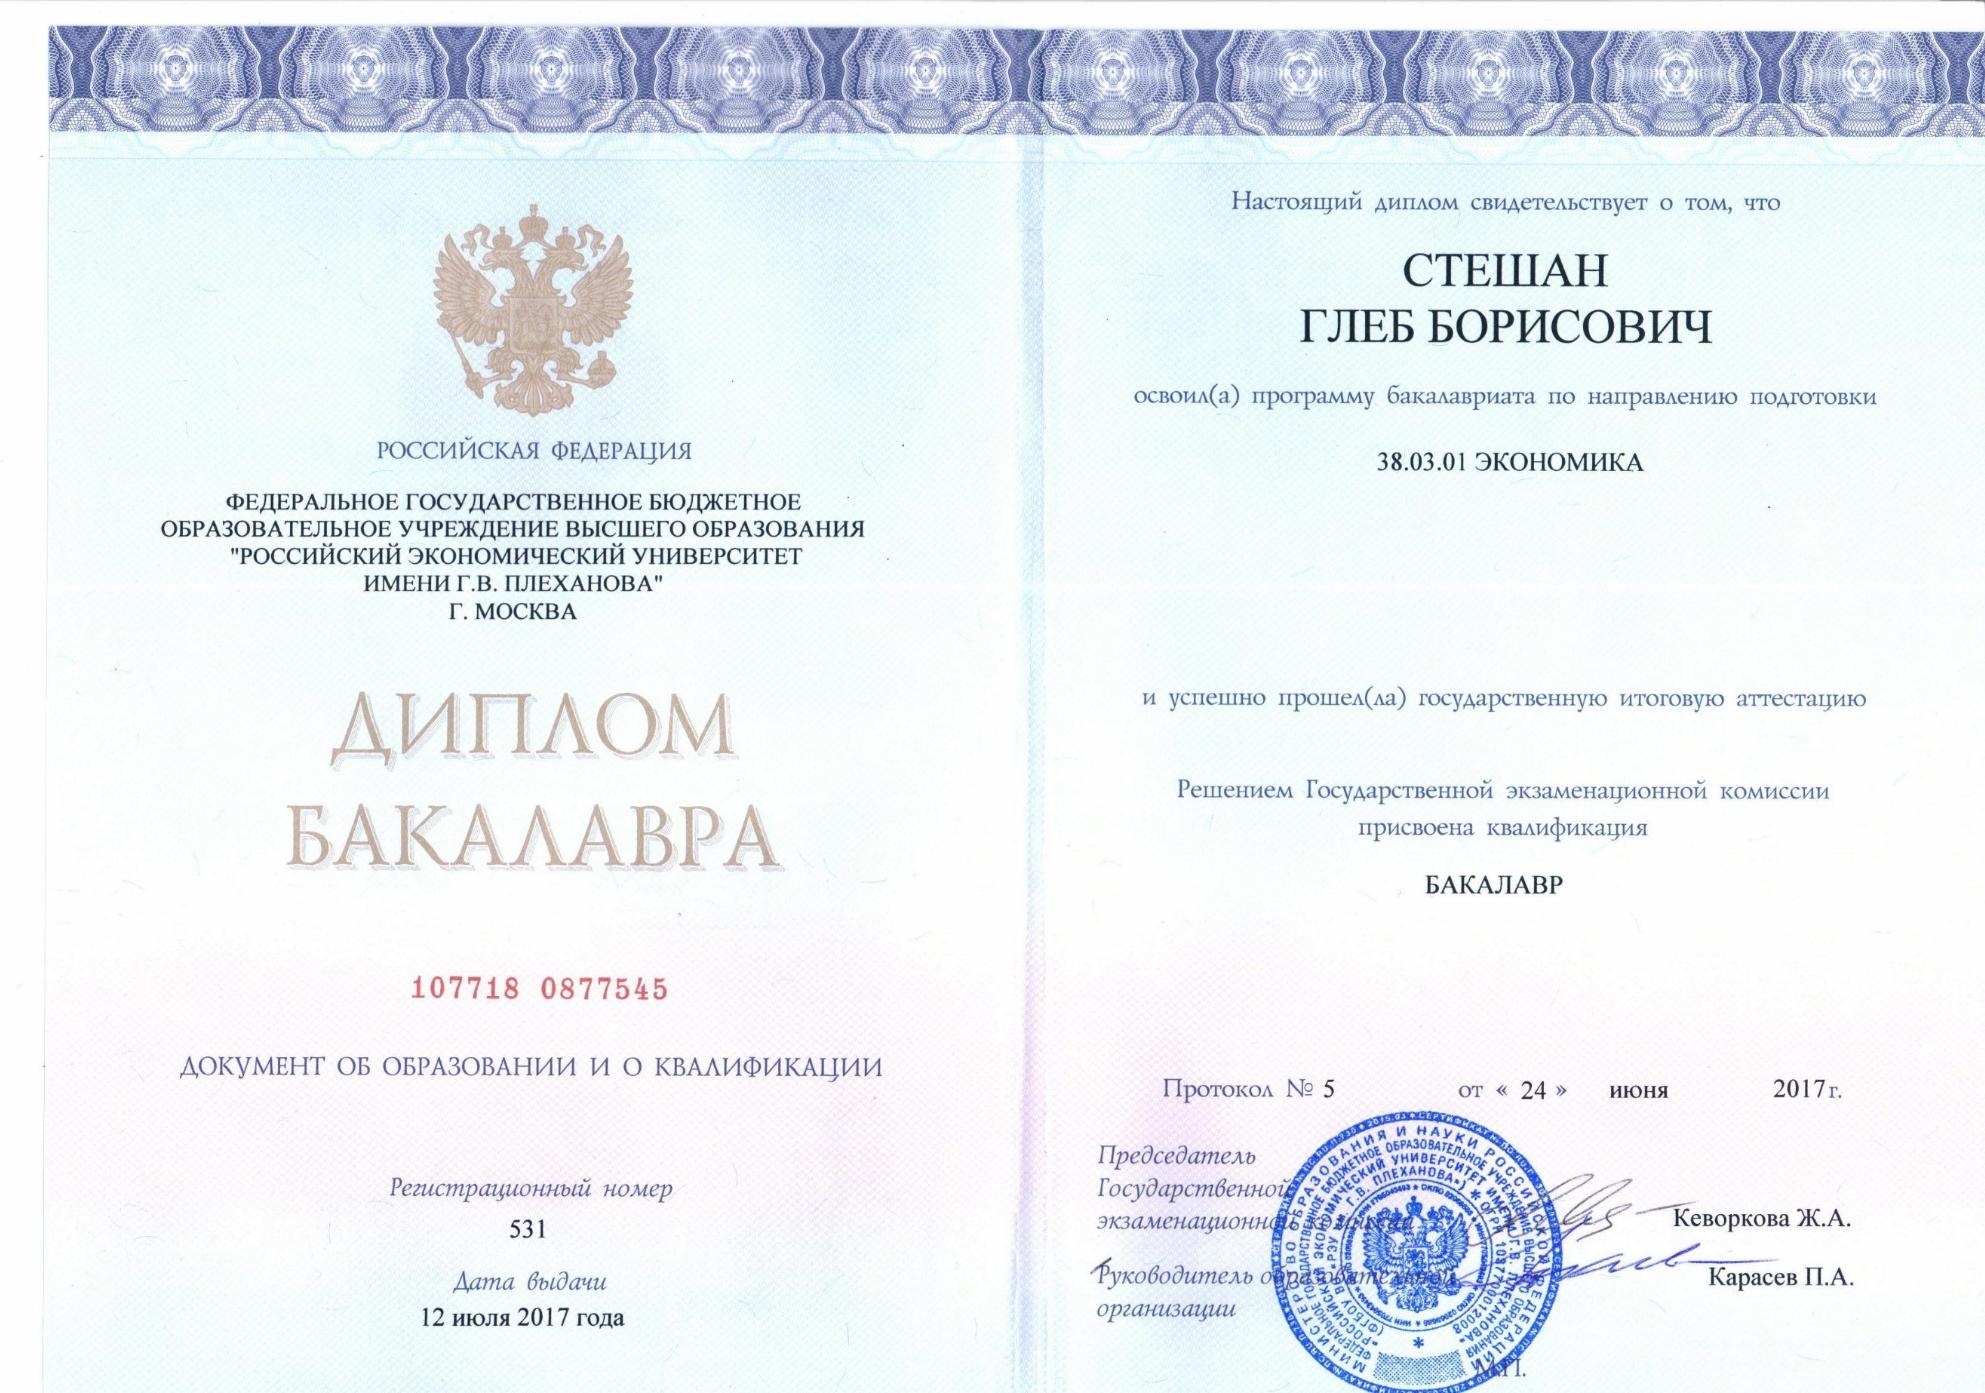 http://www.konsaltingpremium.ru/wp-content/uploads/2018/02/Diplom.jpg